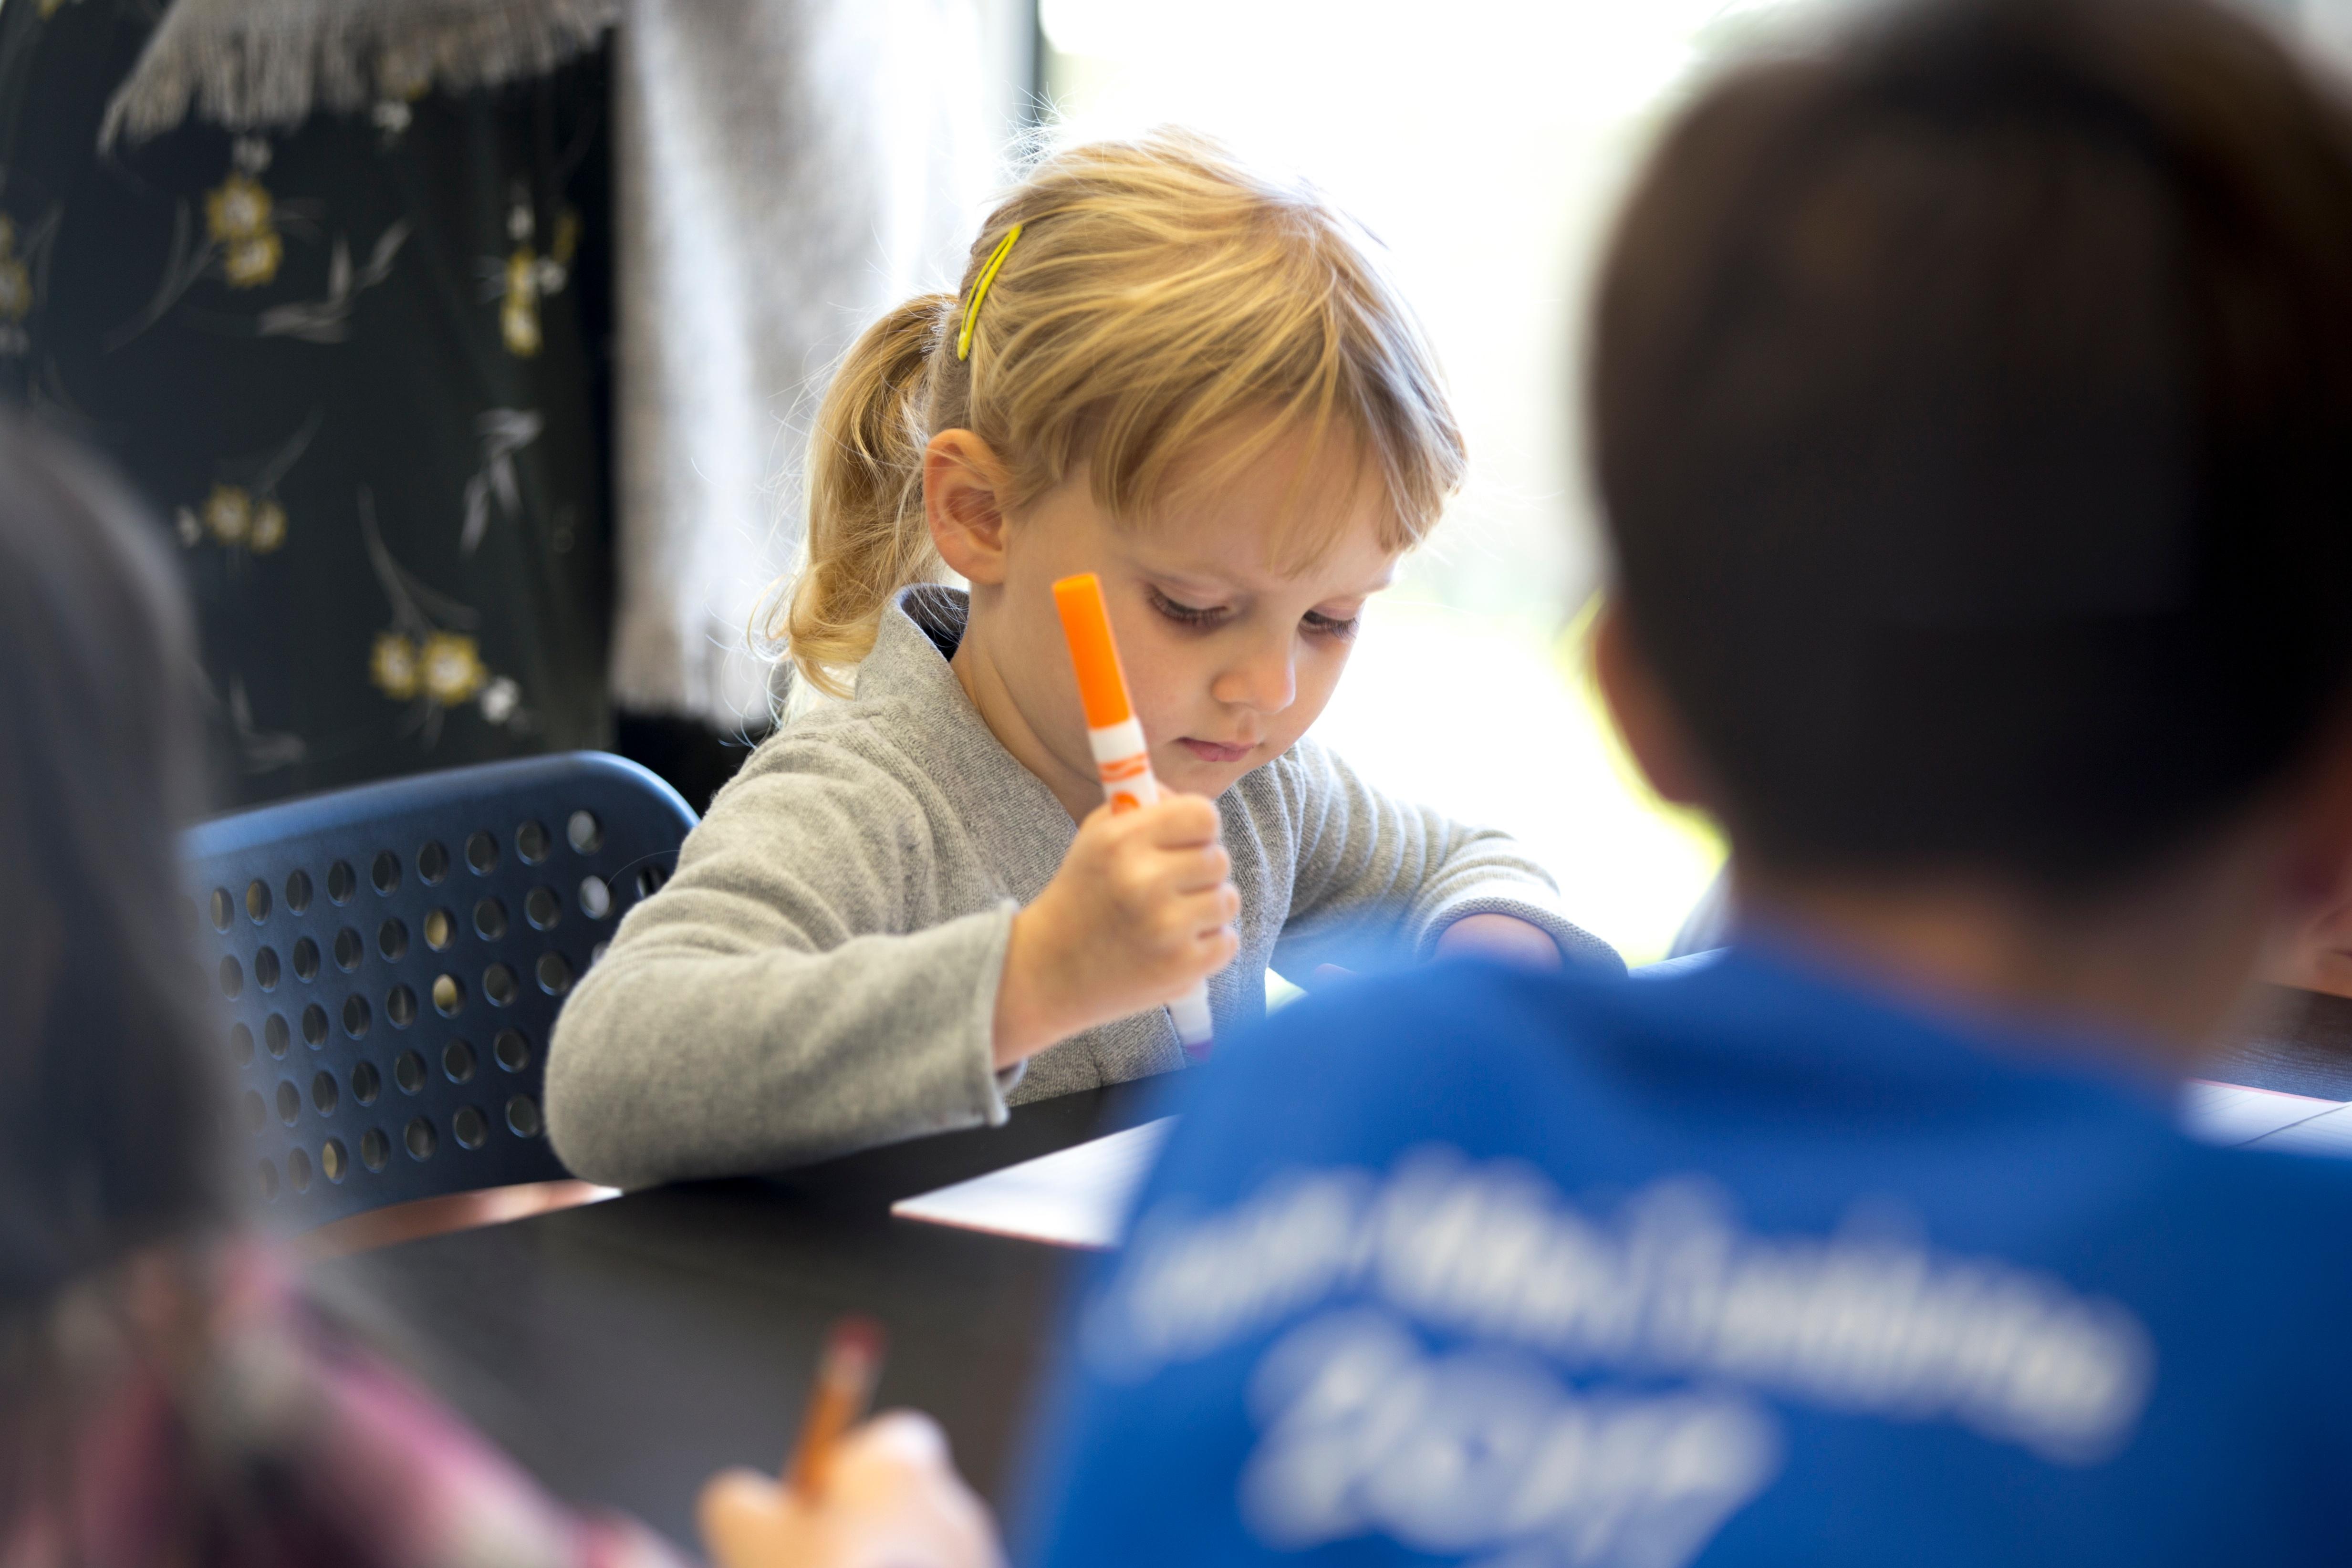 childcare strike school education learning spellread reading program read write spell tutor tutoring